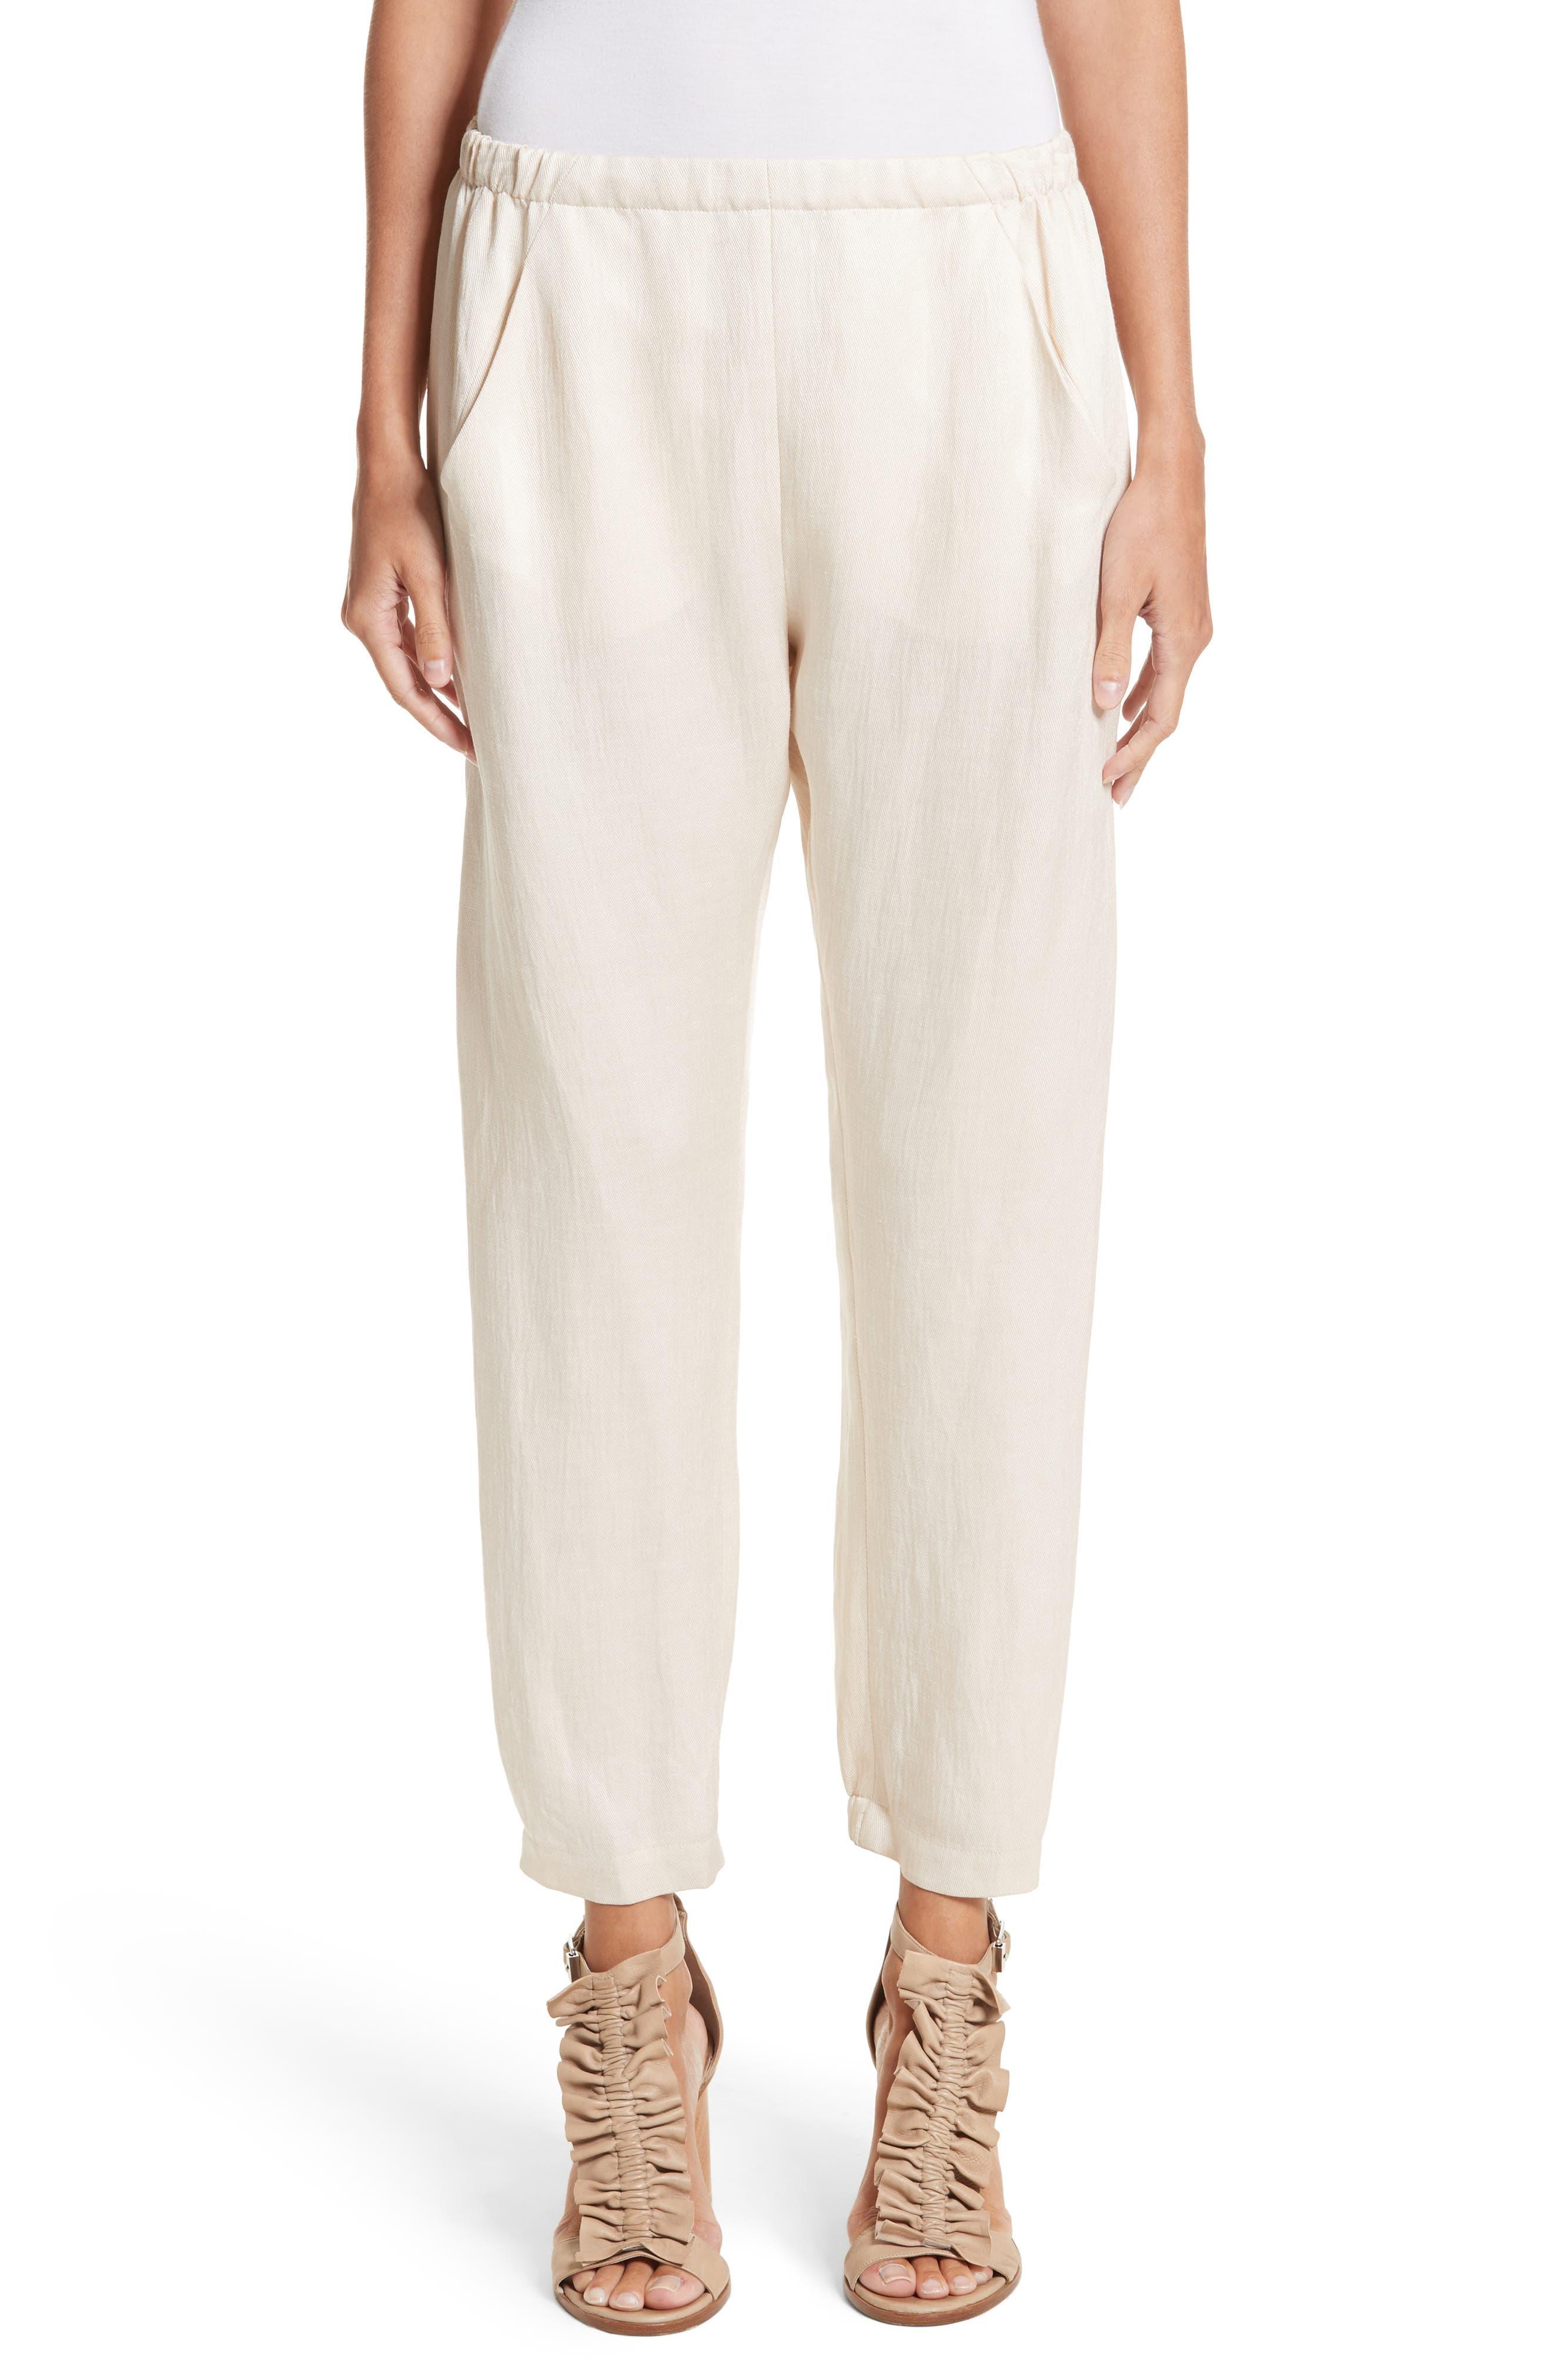 Gabi Eco Drape Pants,                         Main,                         color, 900